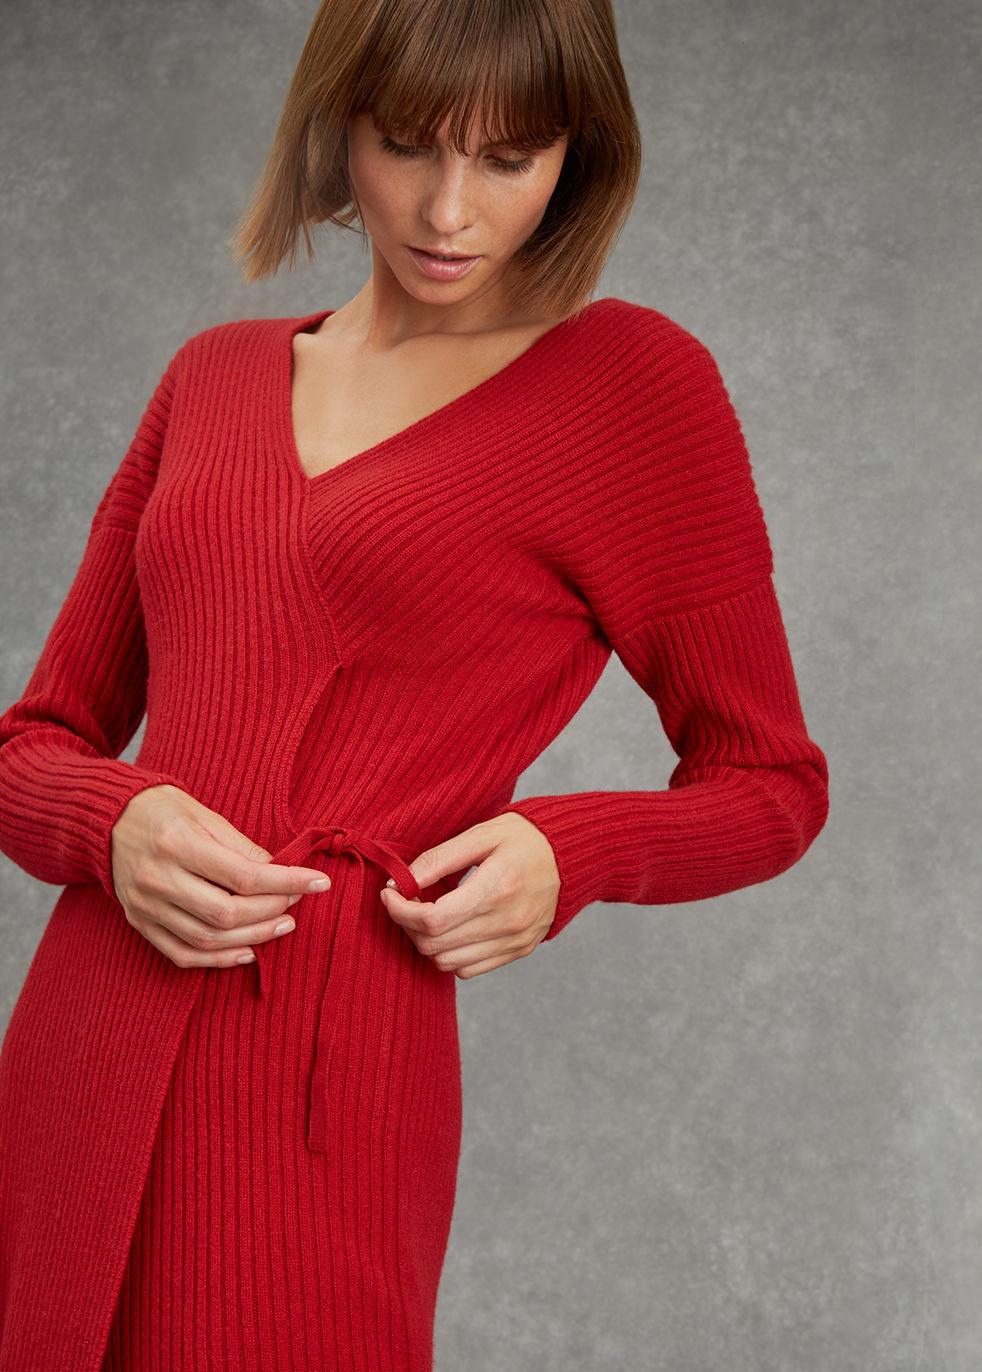 Red wrap ribbed cashmere dress - Varana